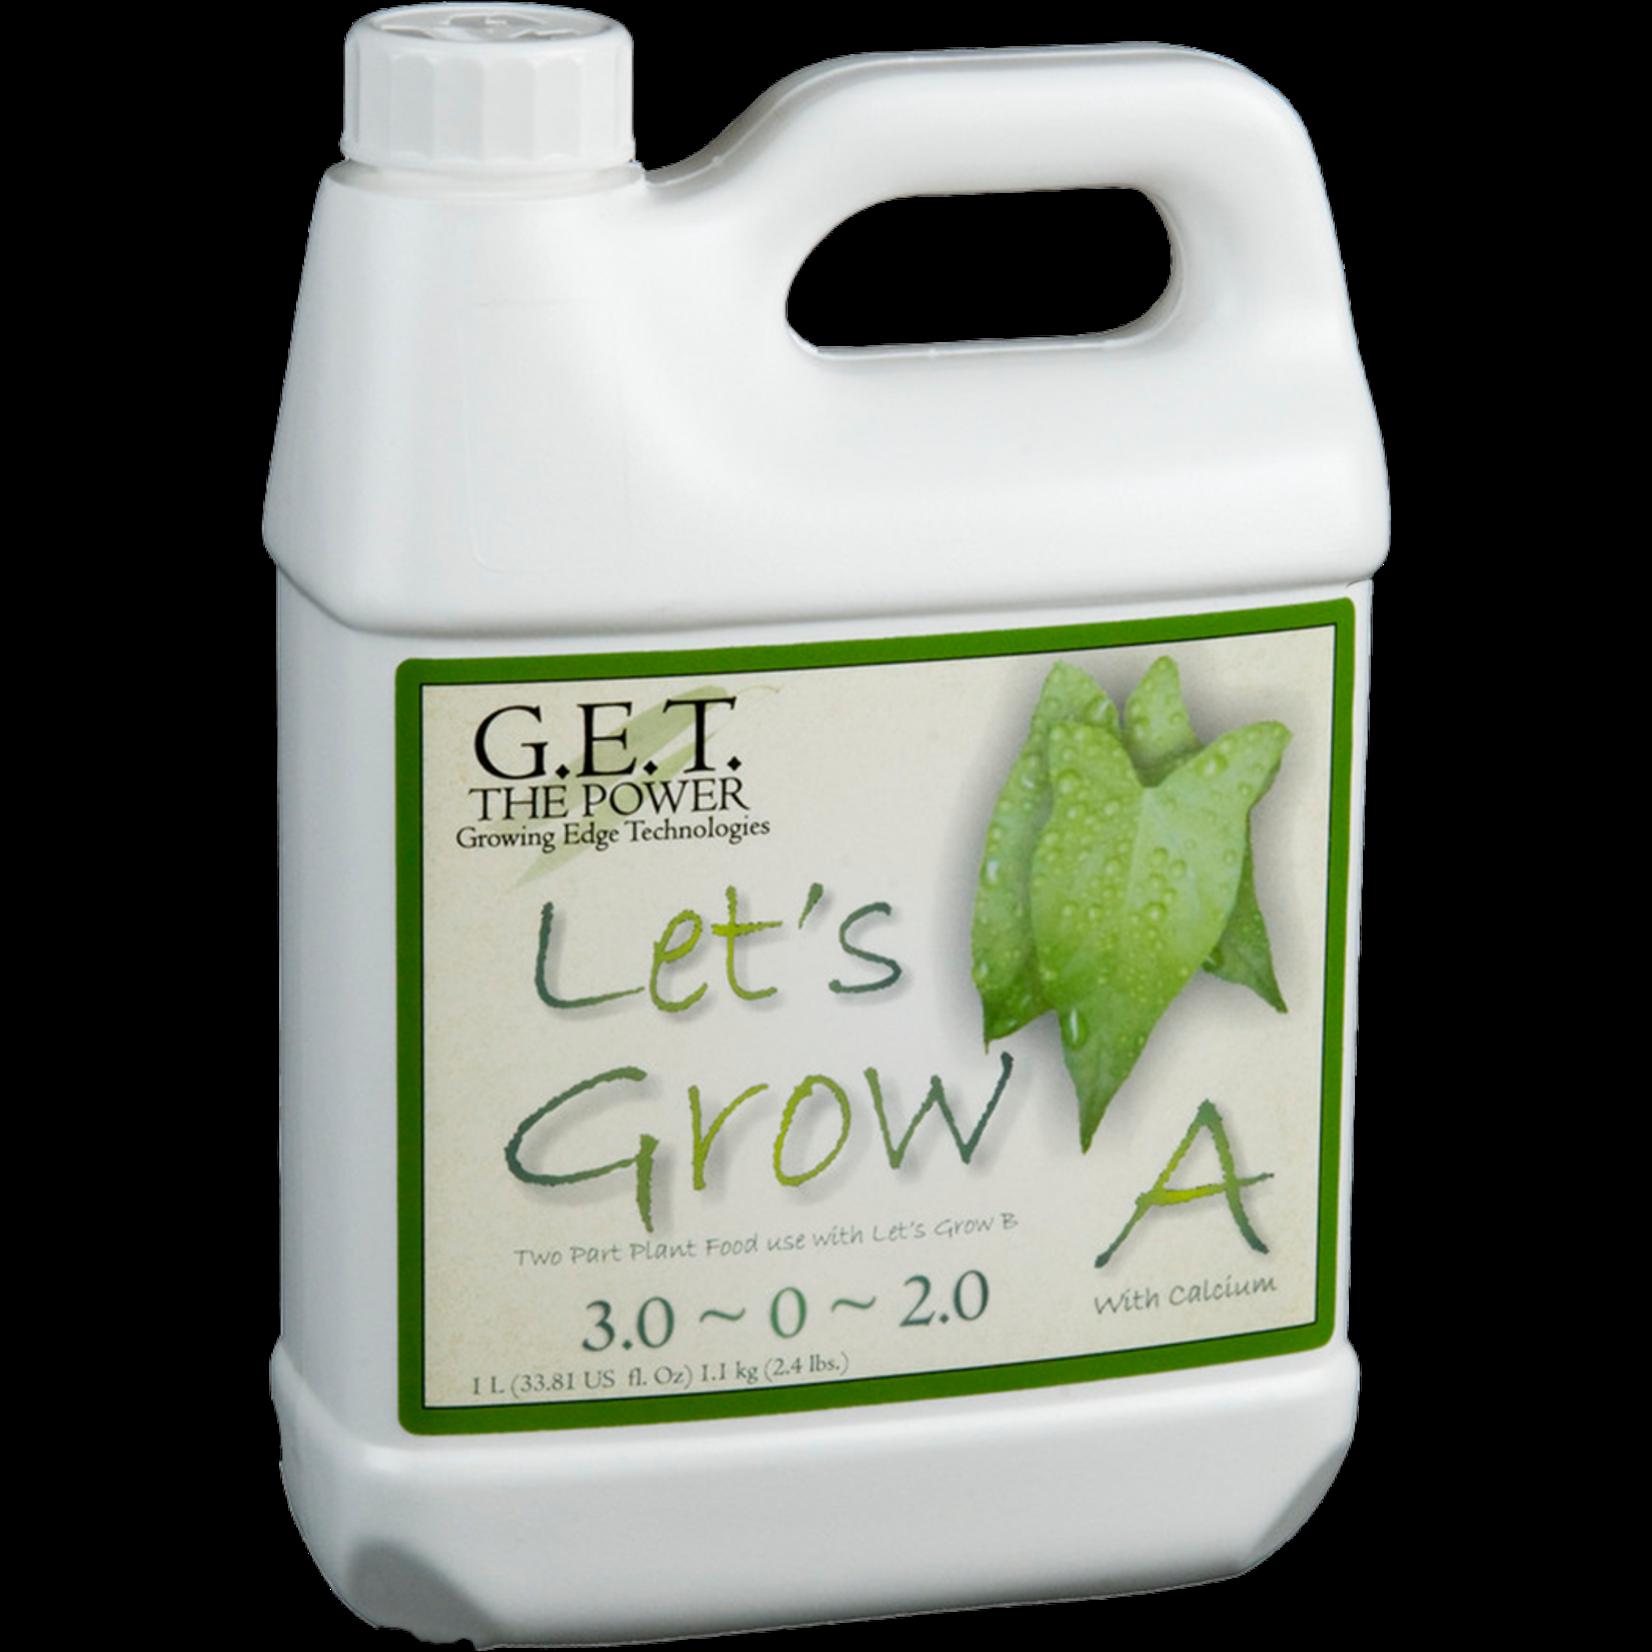 G.E.T. Nutrients Lets Grow A